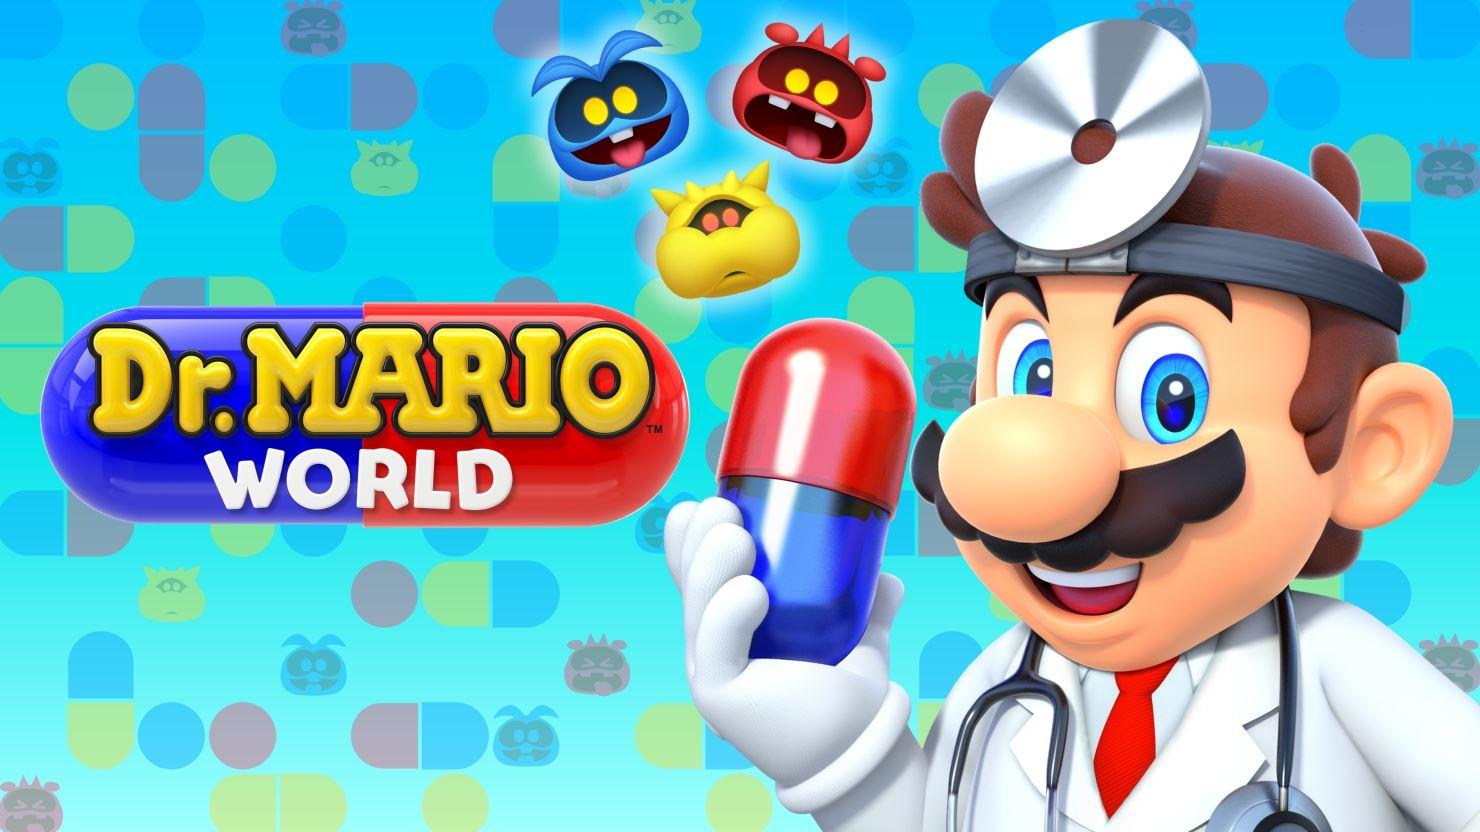 Dr. Mario World за три дня загрузили более двух миллионов раз